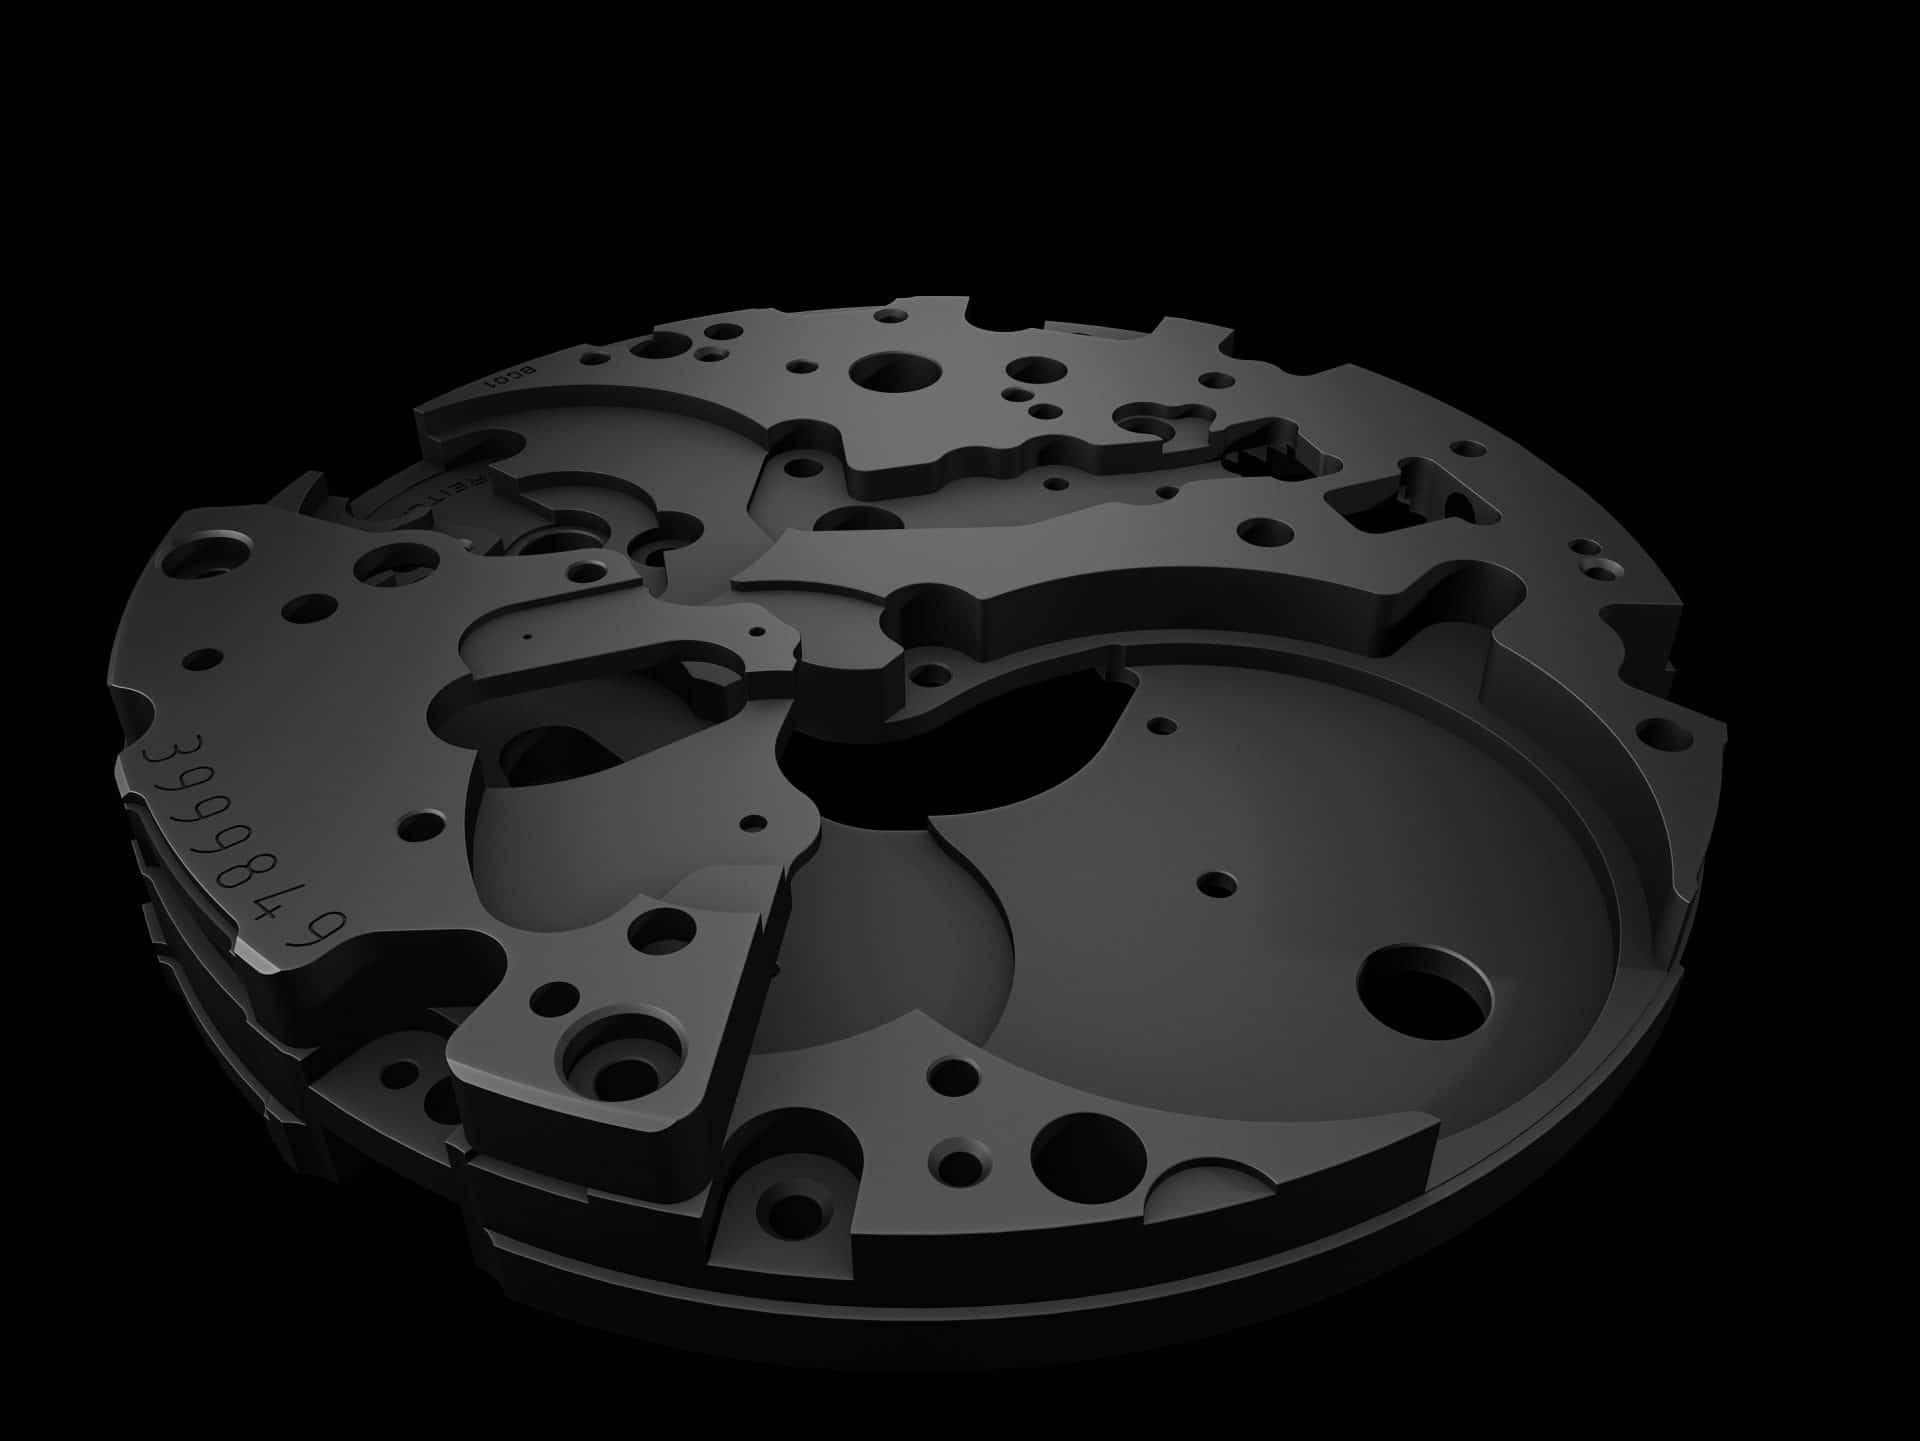 Keramik-Platine einer Breitling Superocean Heritage Chronoworks Breitling Caliber 01